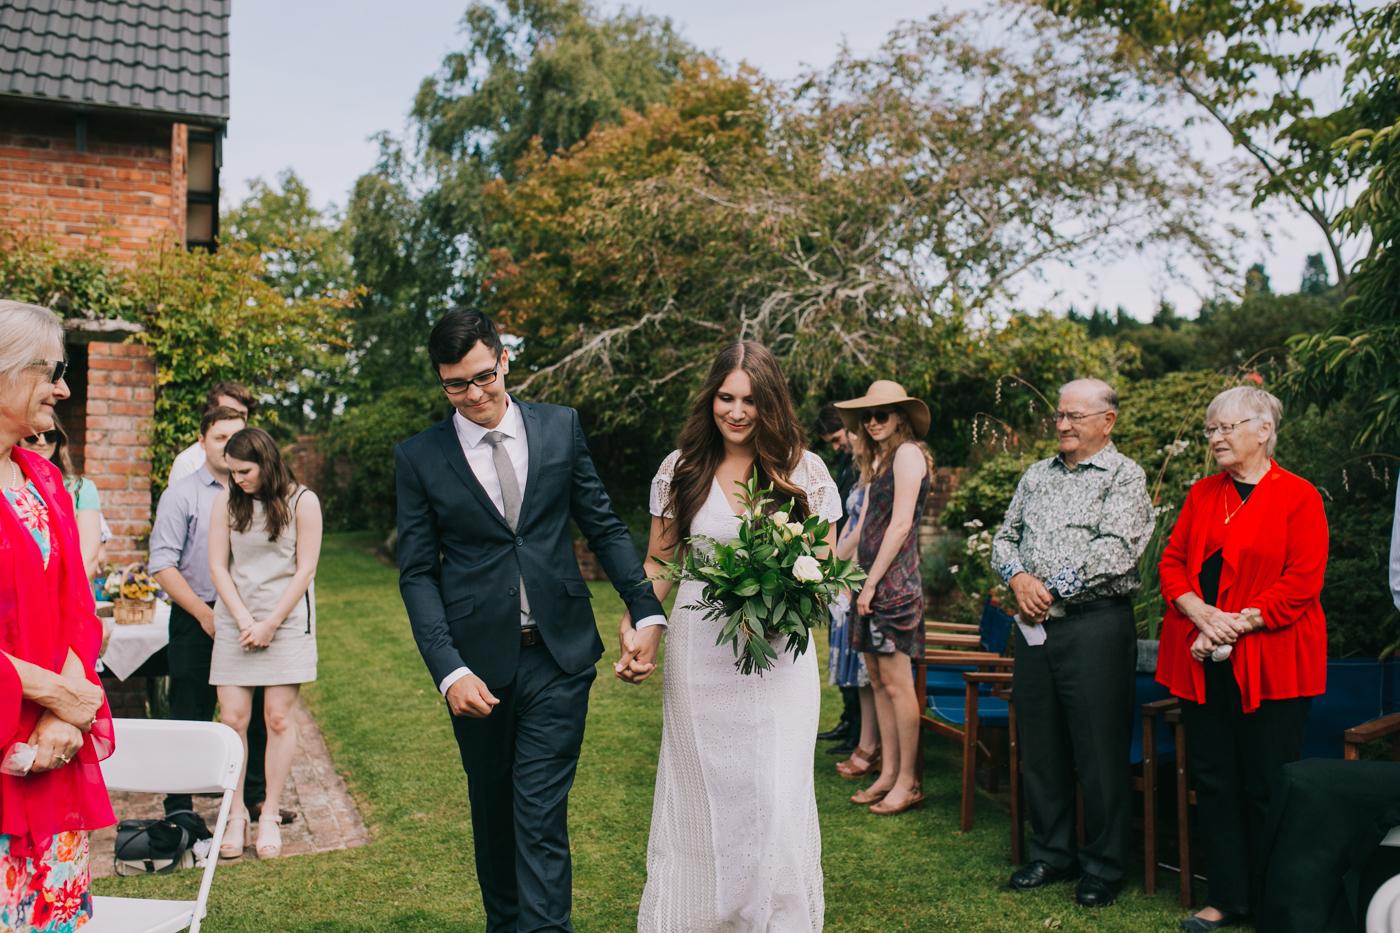 Ariana & Tim - Dunedin, New Zealand Wedding - Destination Wedding - Samantha Heather Photography-82.jpg